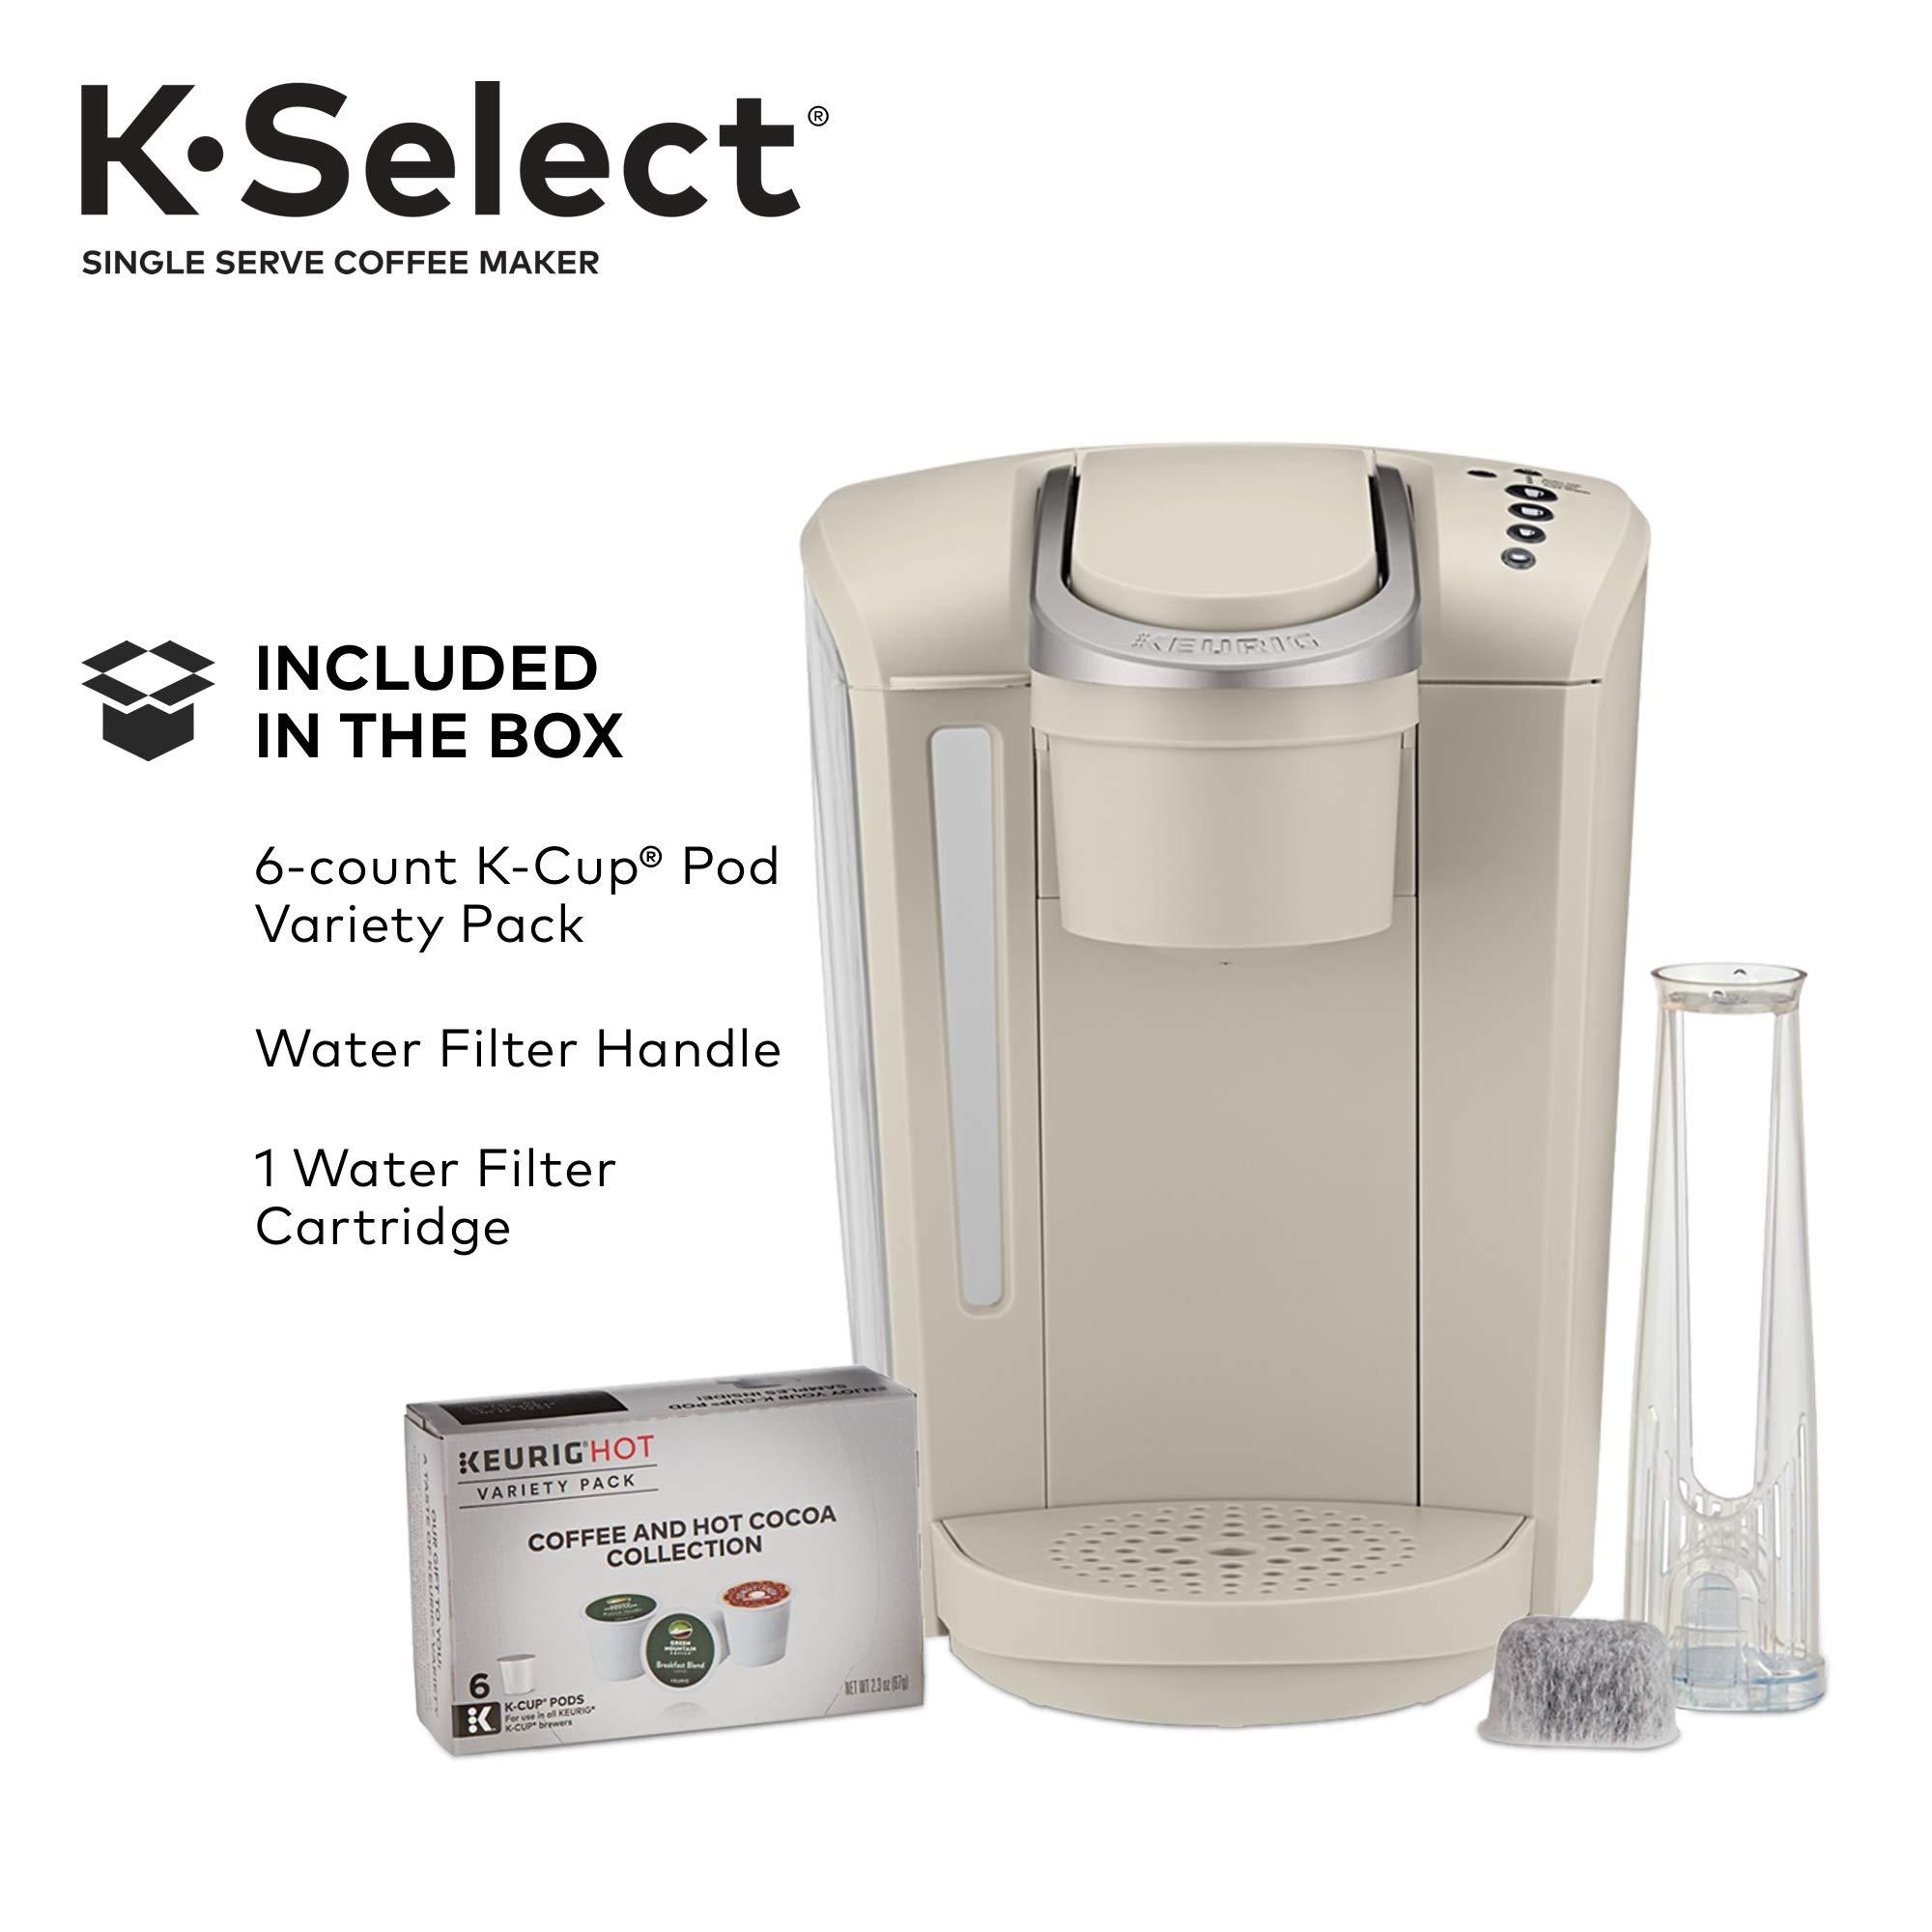 Keurig K-Select Single-Serve K-Cup Pod Coffee Maker, Sandstone by Keurig (Image #8)